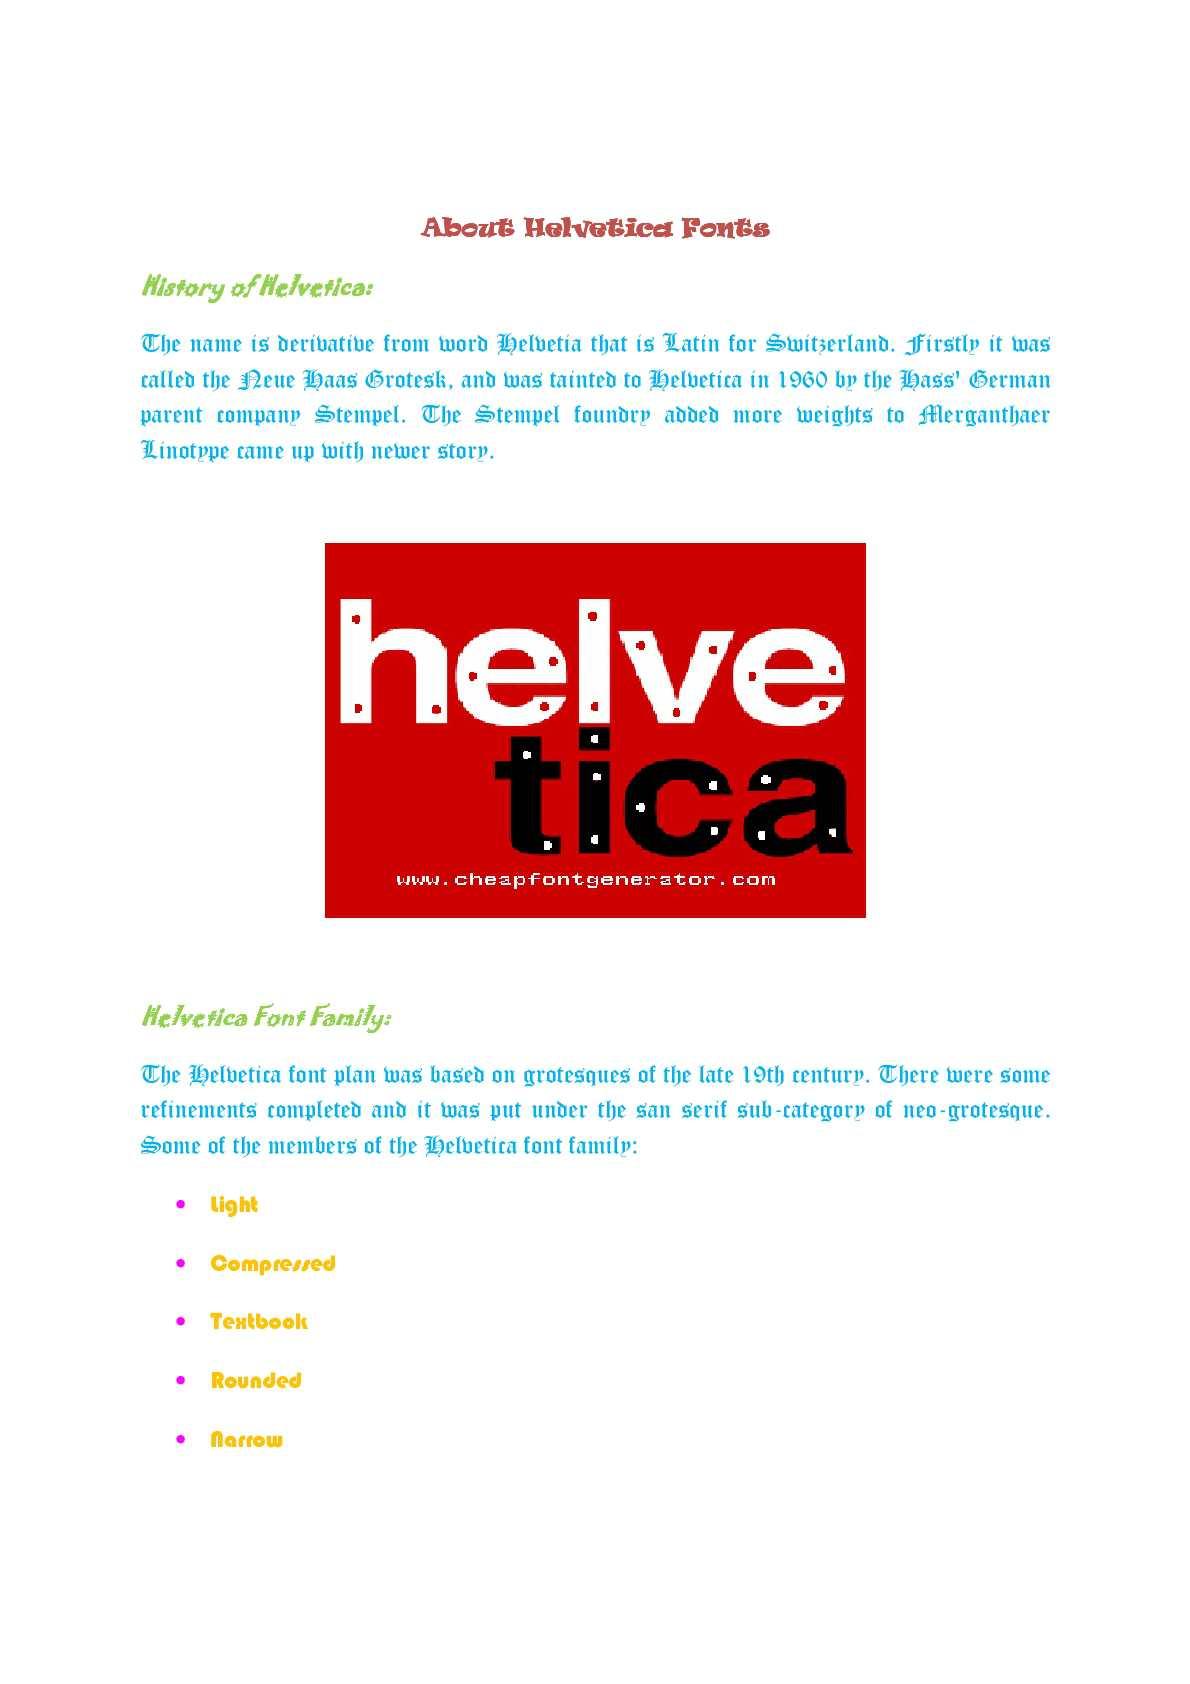 Calaméo - About Helvetica Fonts